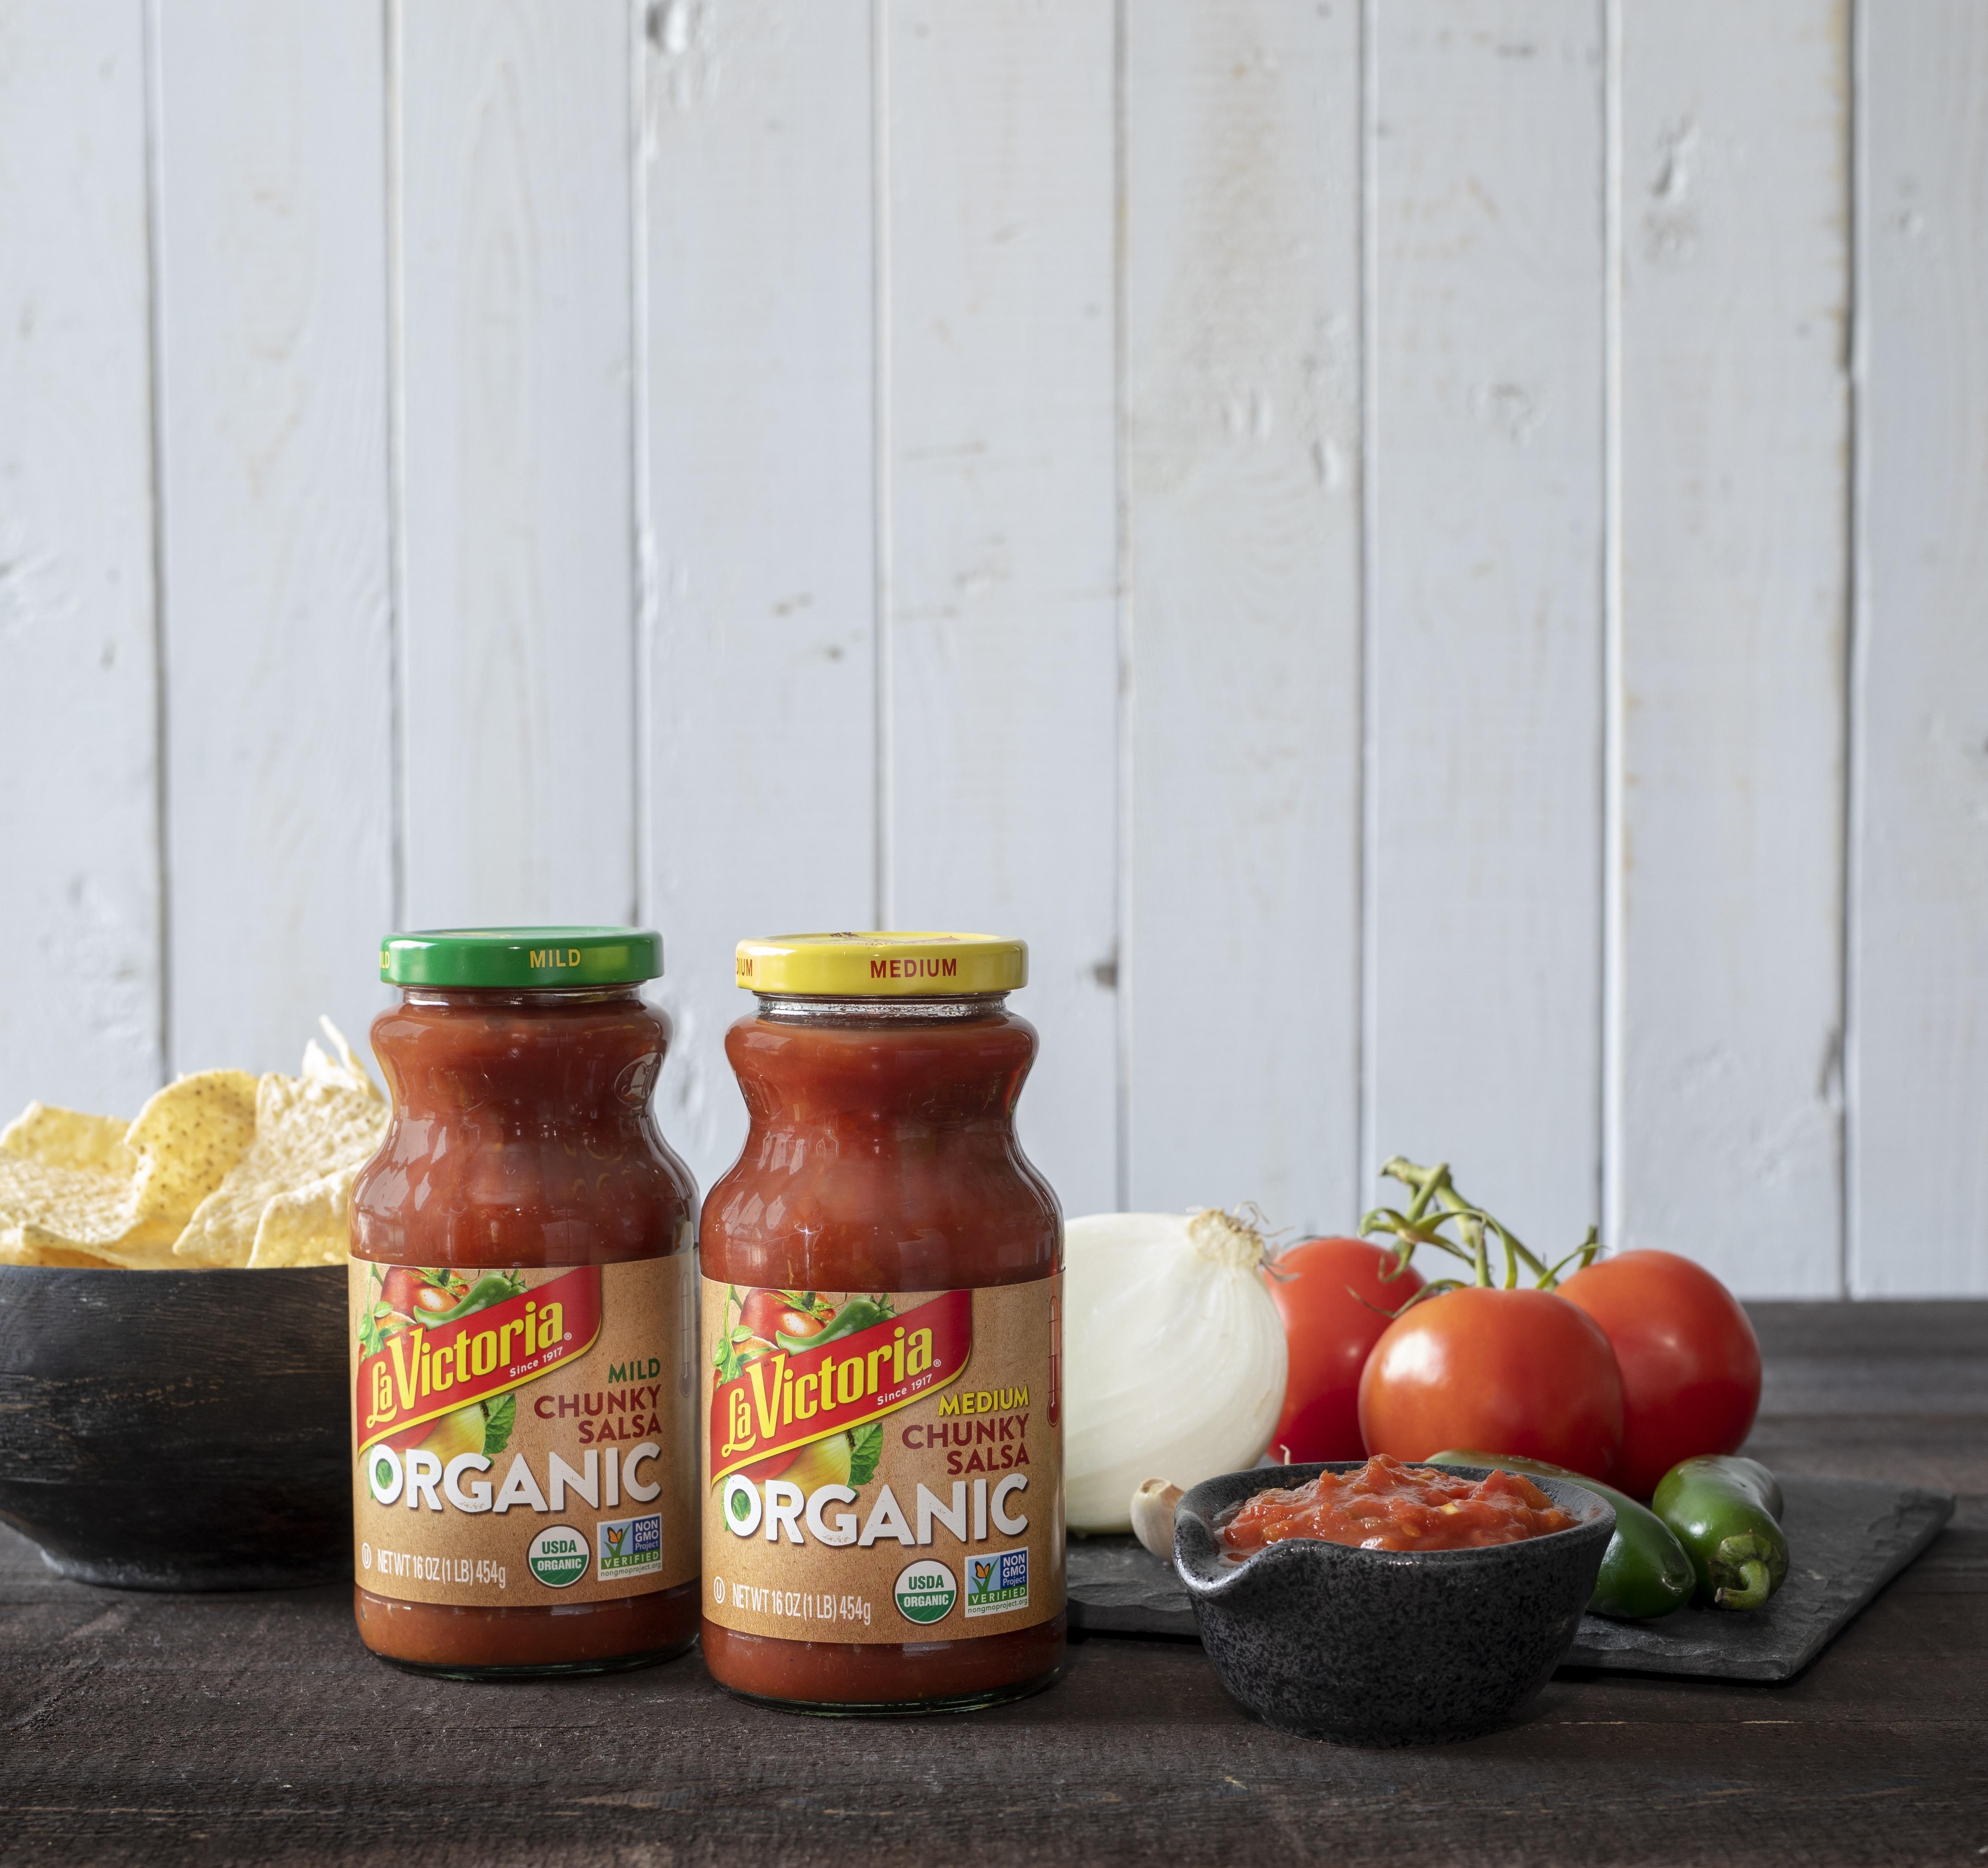 LA VICTORIA Debuts New Line of Organic Salsas